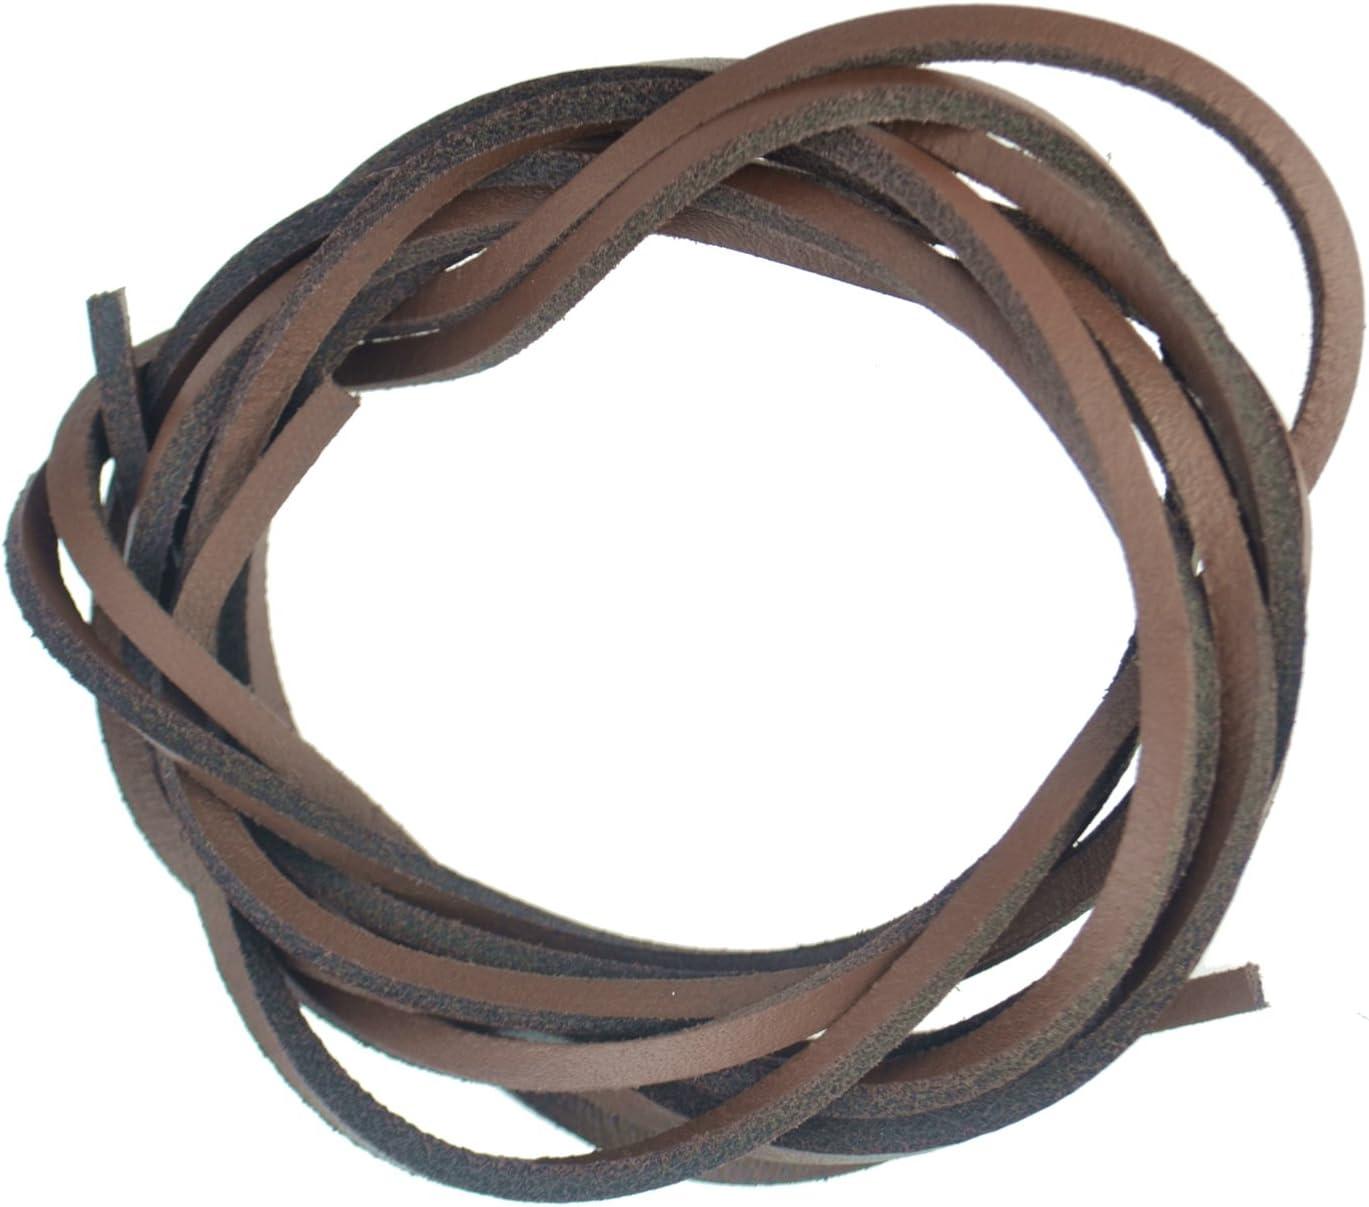 Amazon.com: TSL Leather Shoe Laces